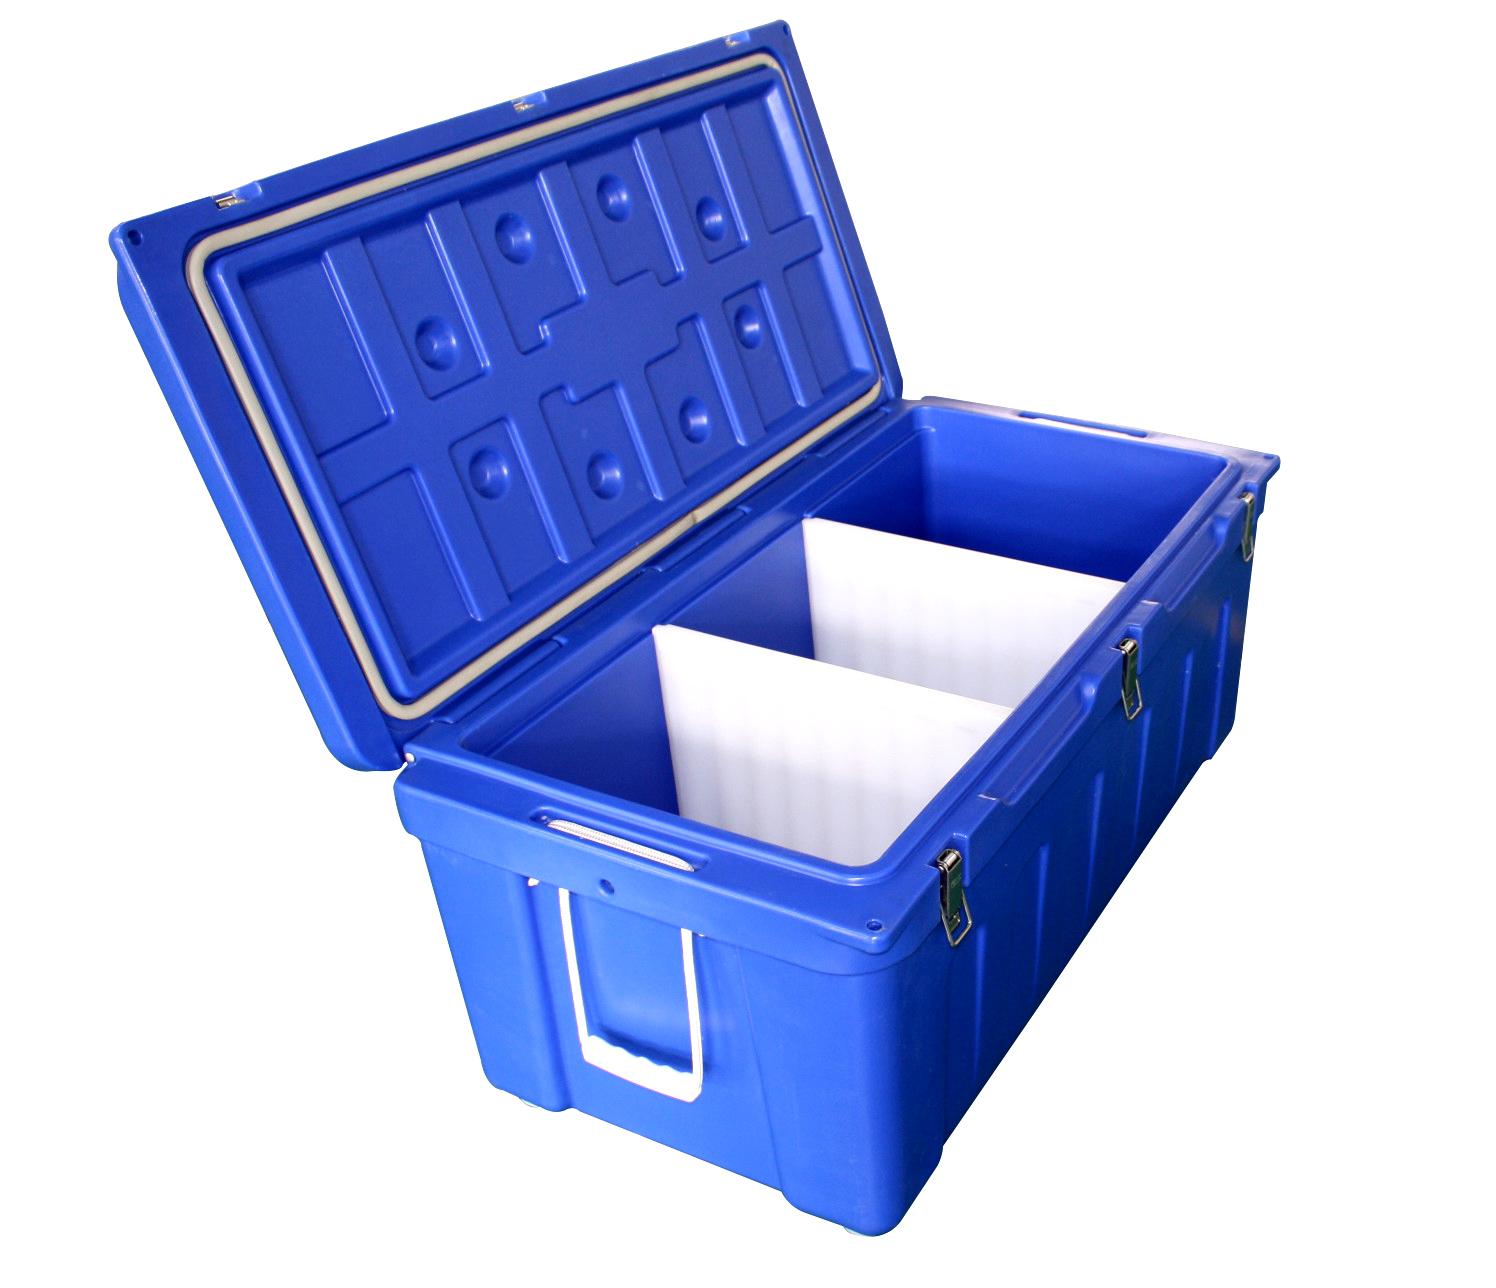 180L Insulated cooler box SB1-A180